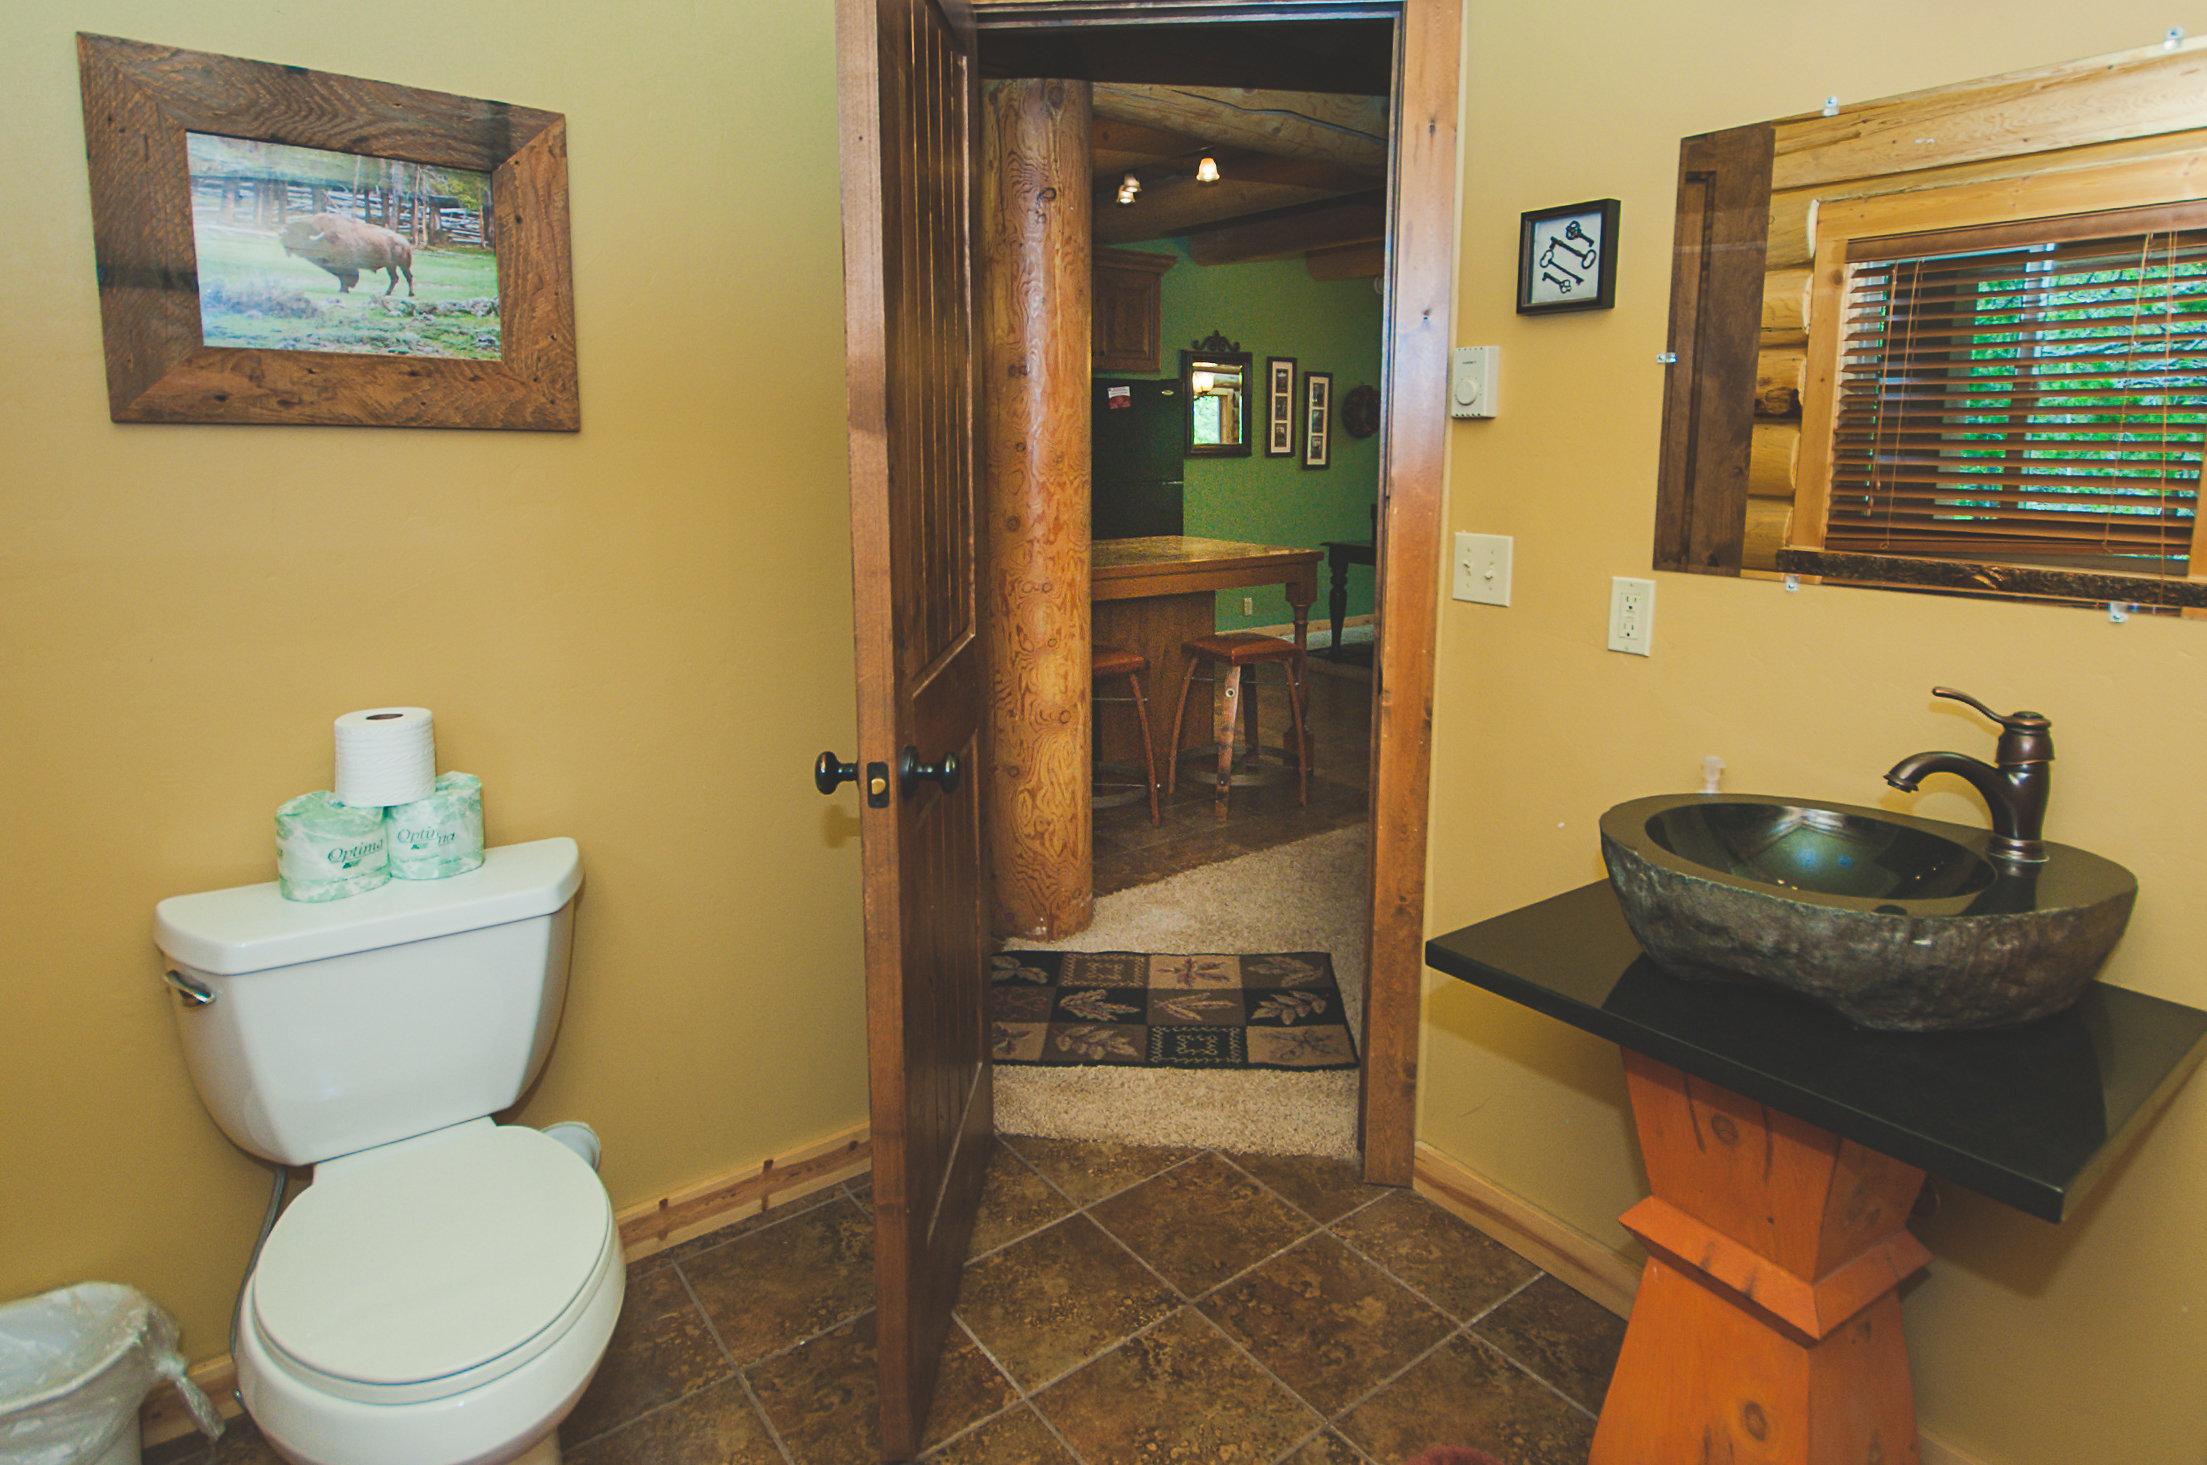 5. C16 Downstairs Bathroom